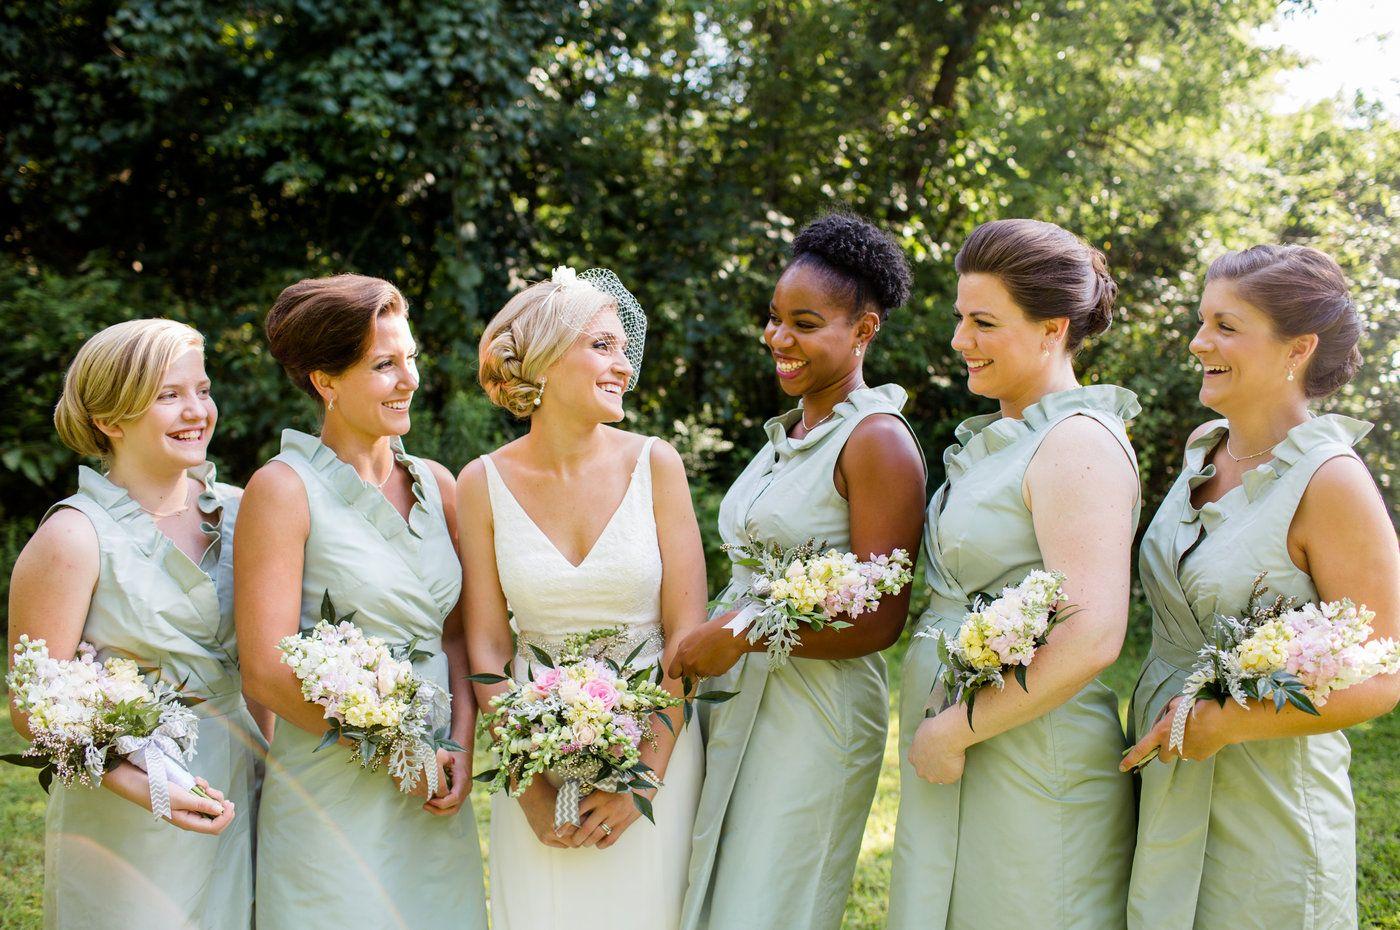 J crew bridesmaid dresses on dusty shale wedding day j crew bridesmaid dresses on dusty shale ombrellifo Gallery